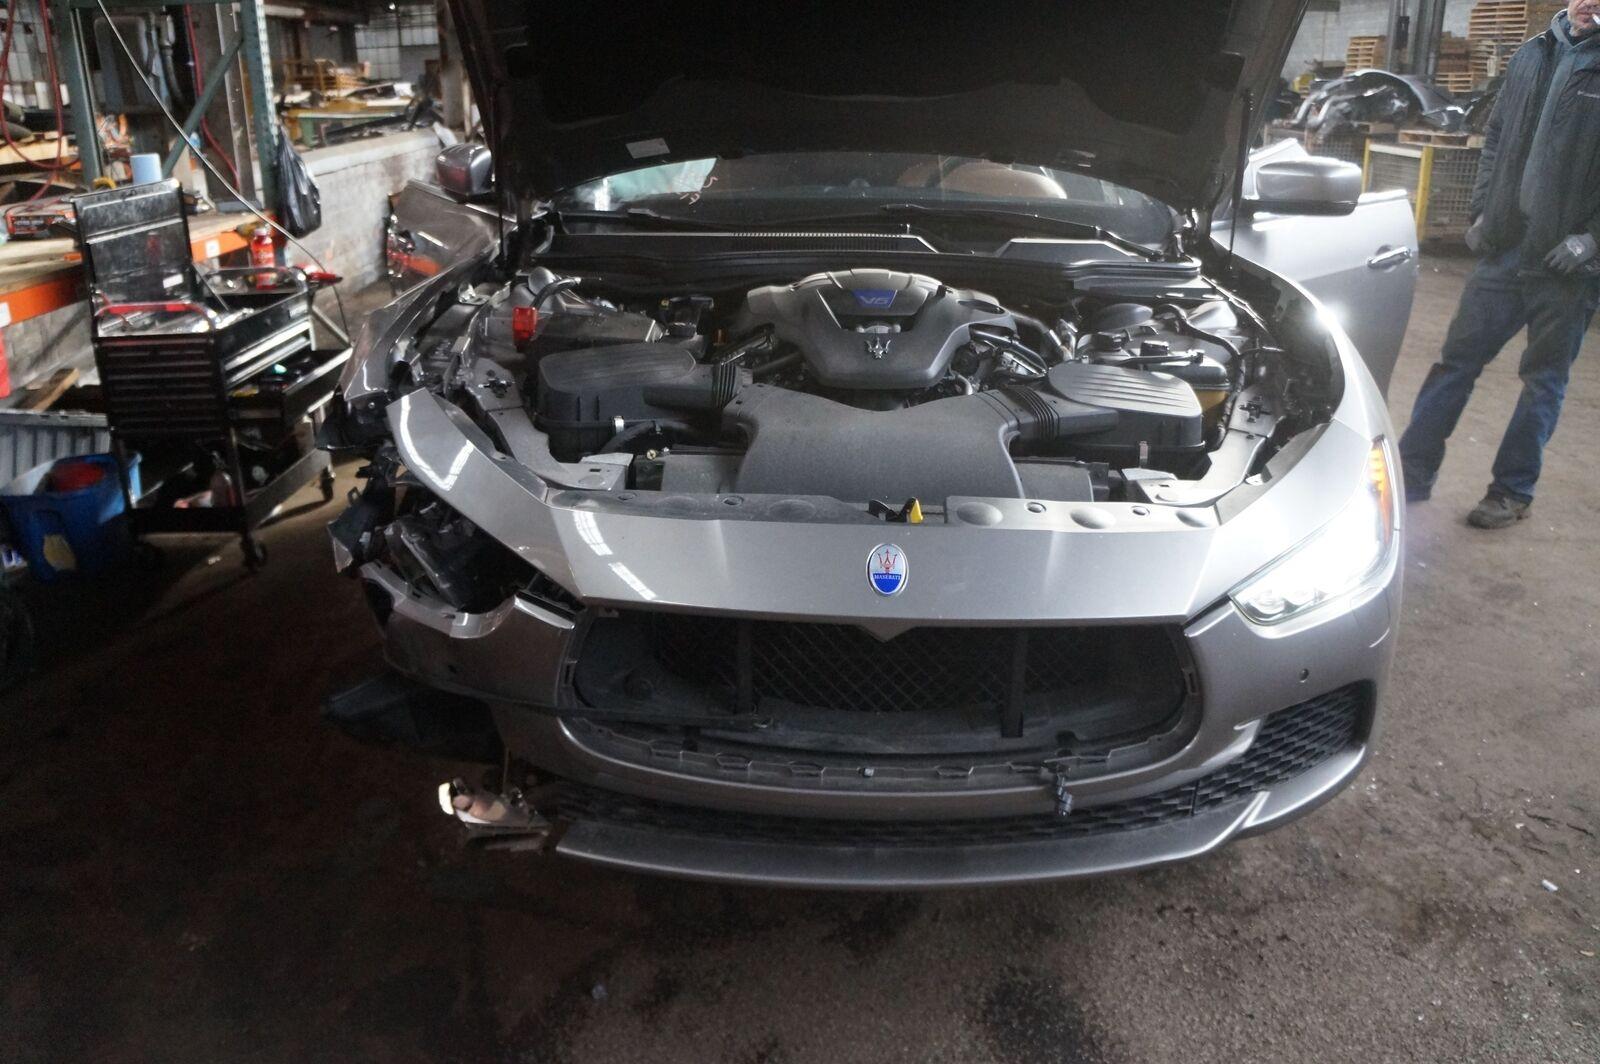 30l V6 Engine Wiring Harness 311643 670007401 Oem Maserati Ghibli Show